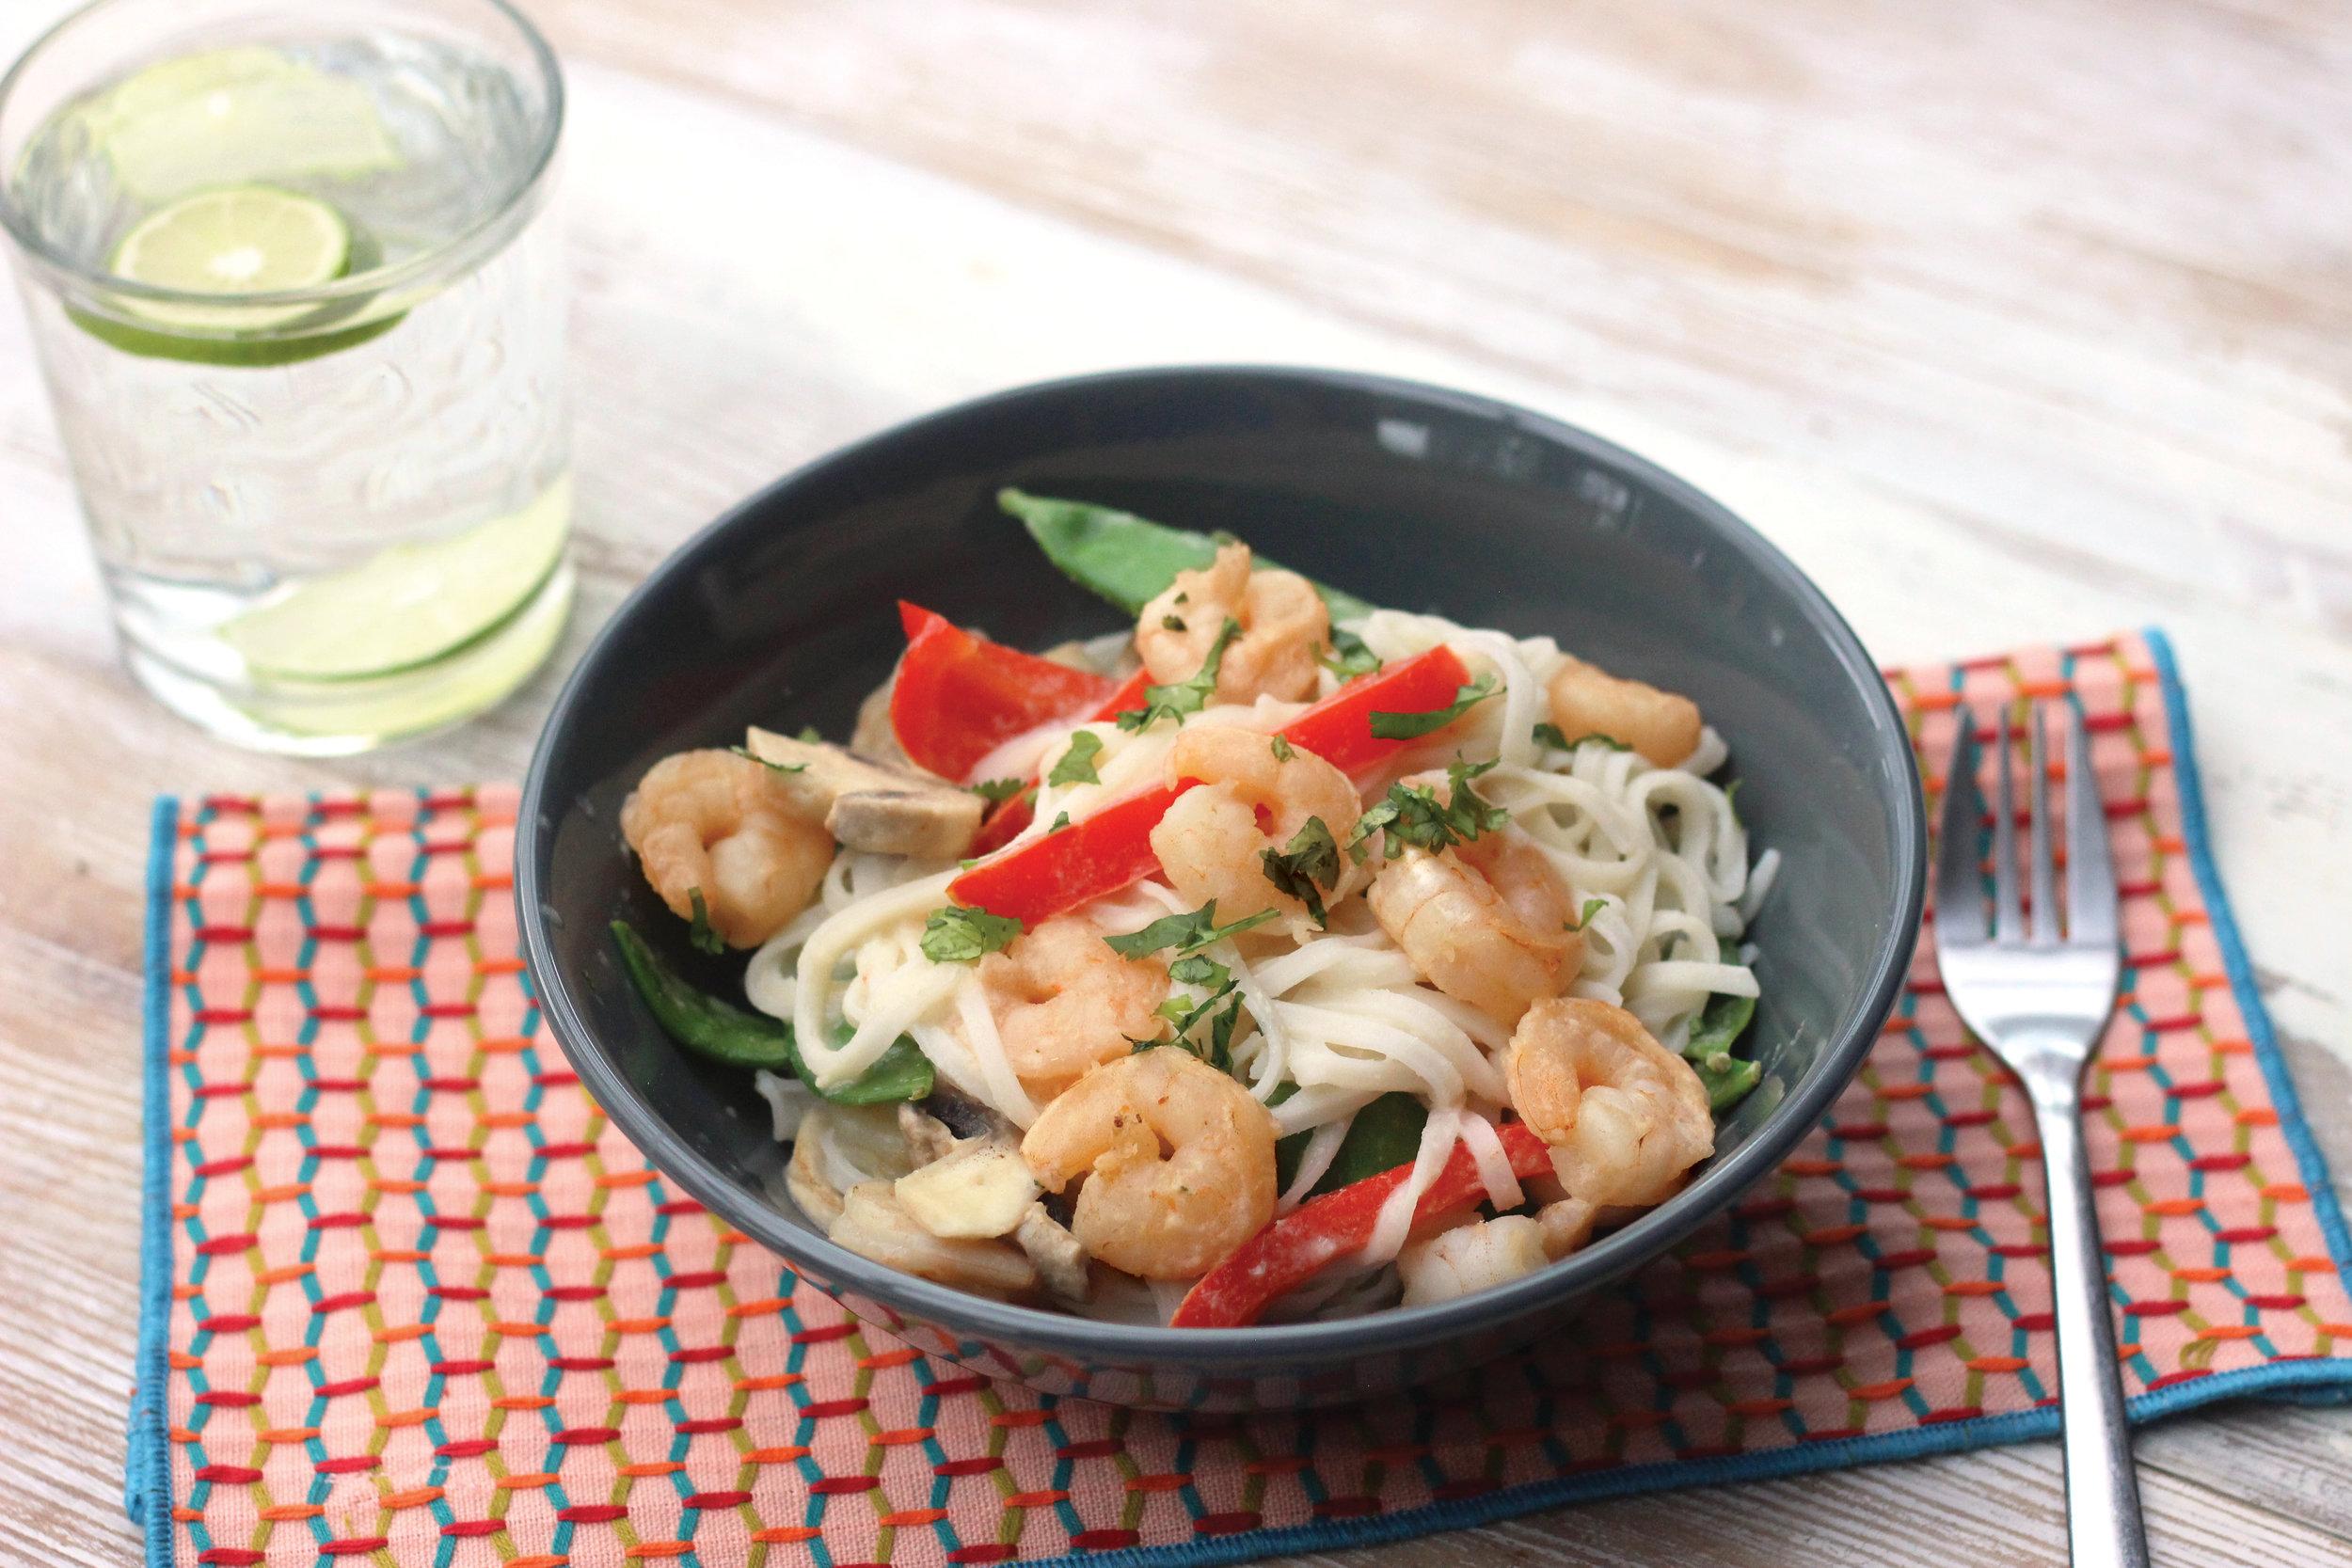 Creamy prawn, coconut & lemongrass stir fry.JPG